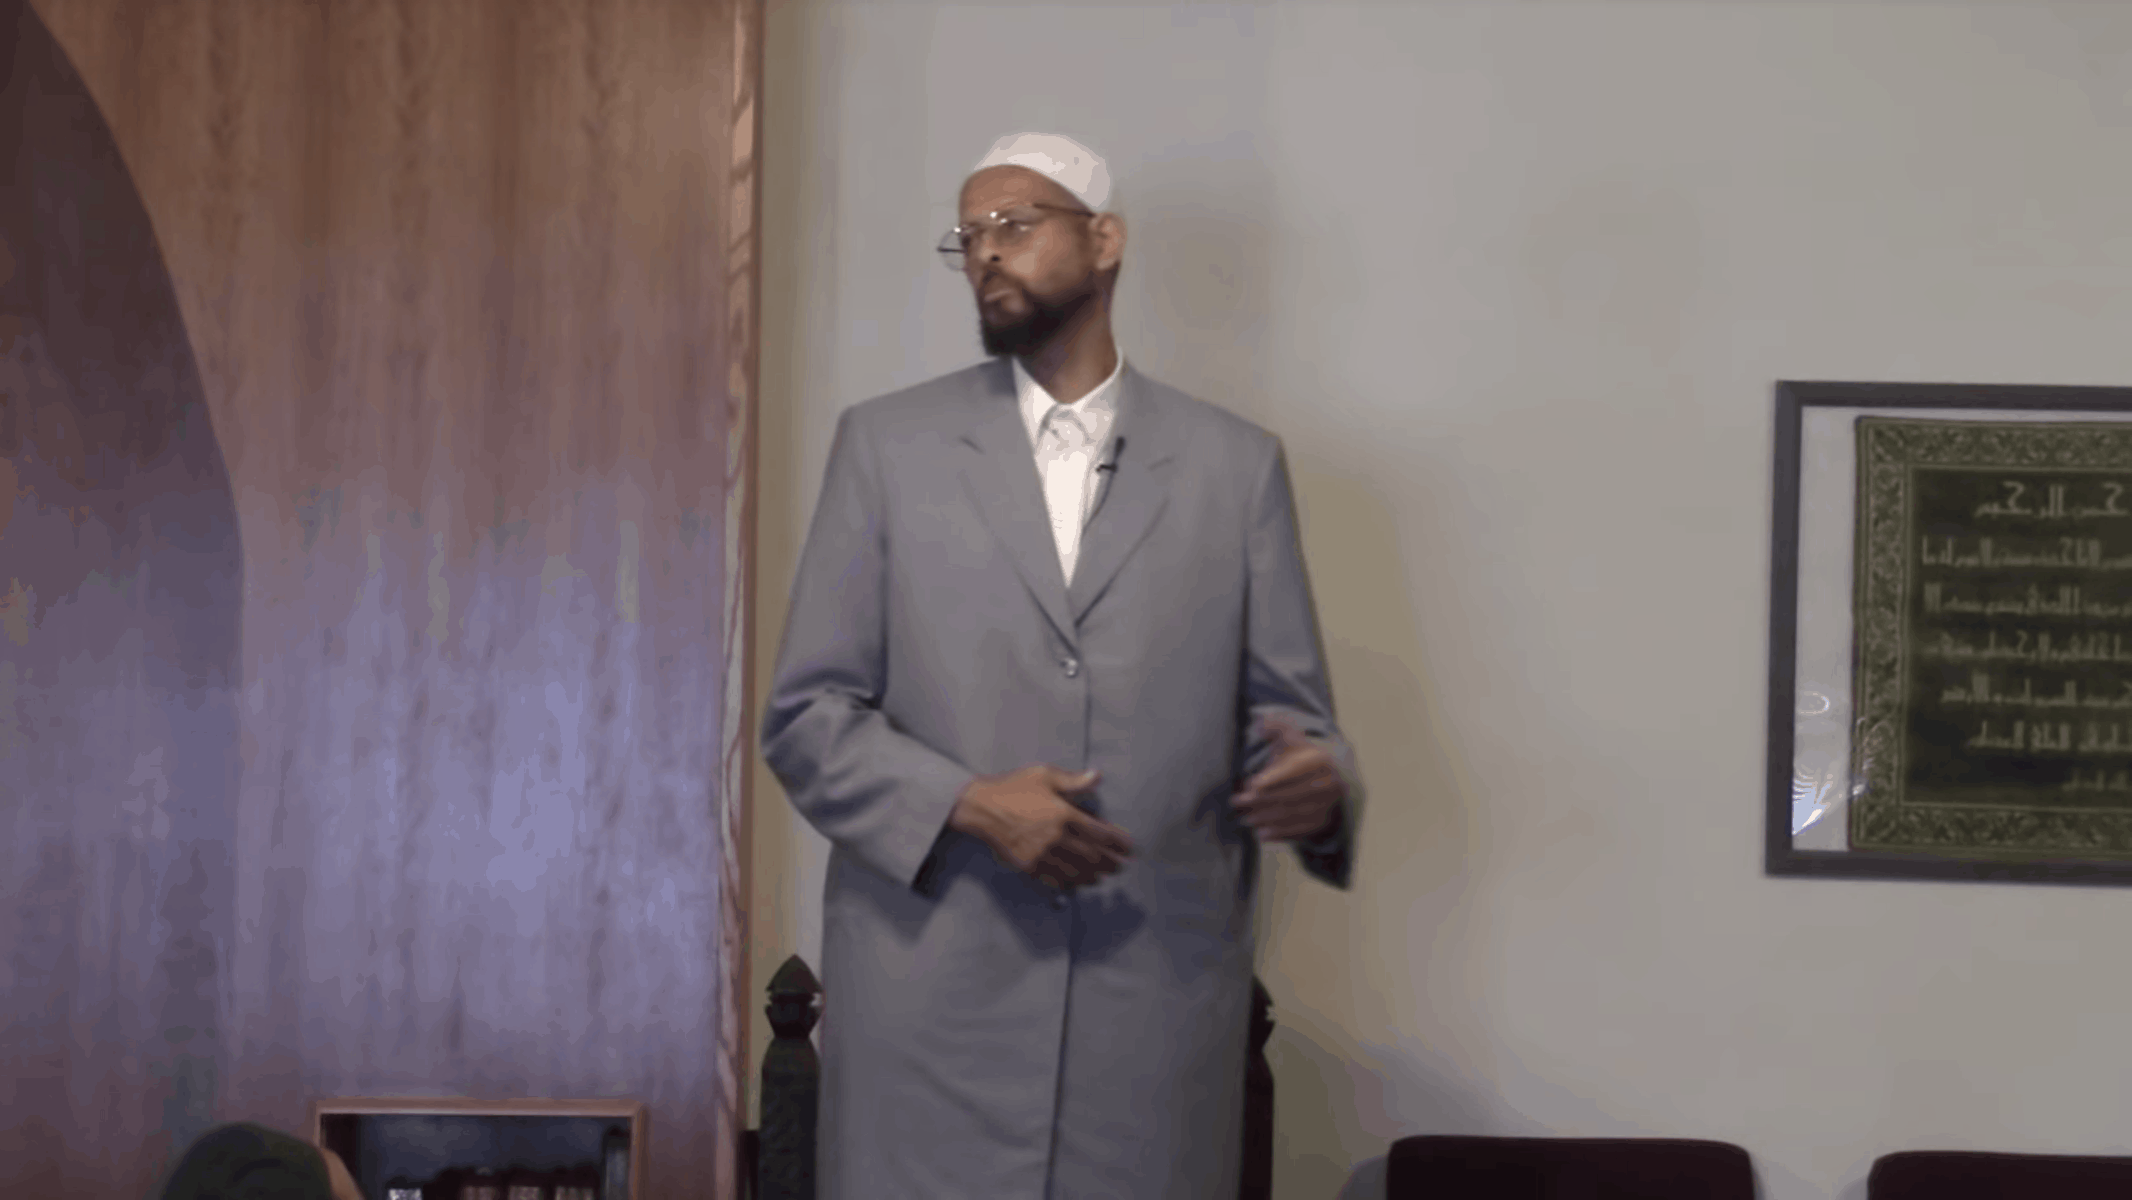 Zaid Shakir – Transcend This World